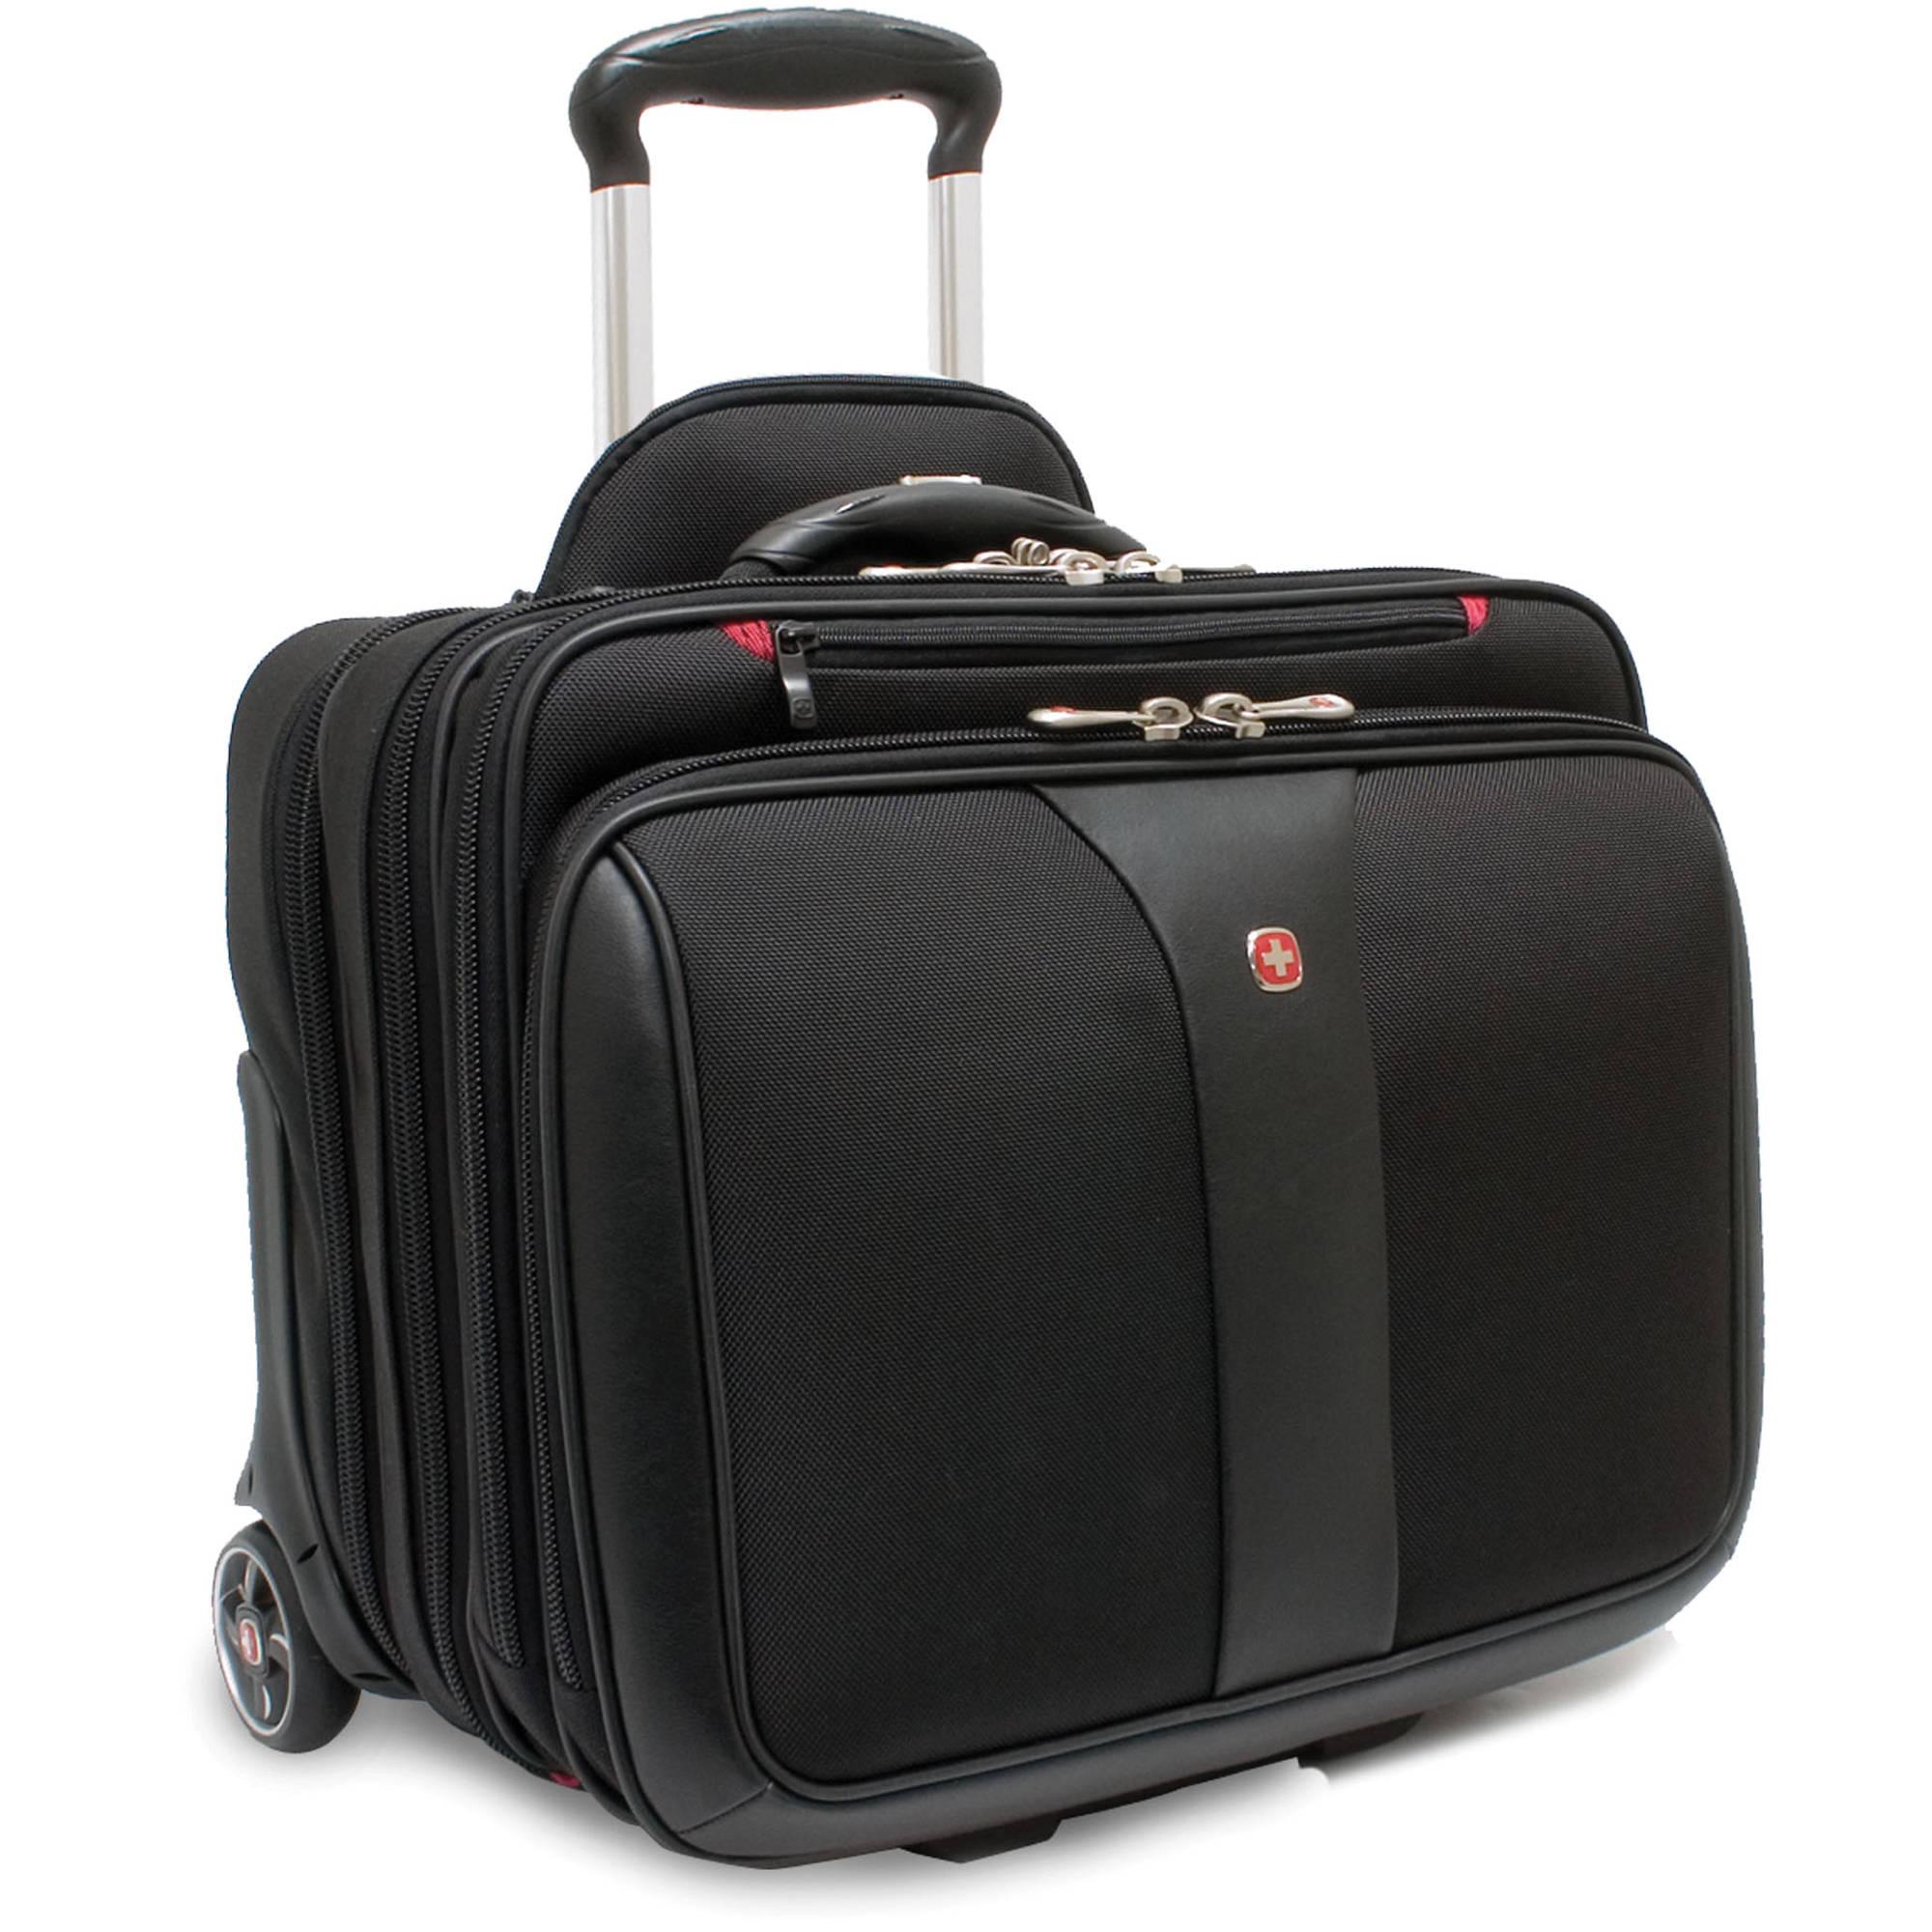 Swissgear Patriot Wheeled 2 Piece 17 Laptop Case